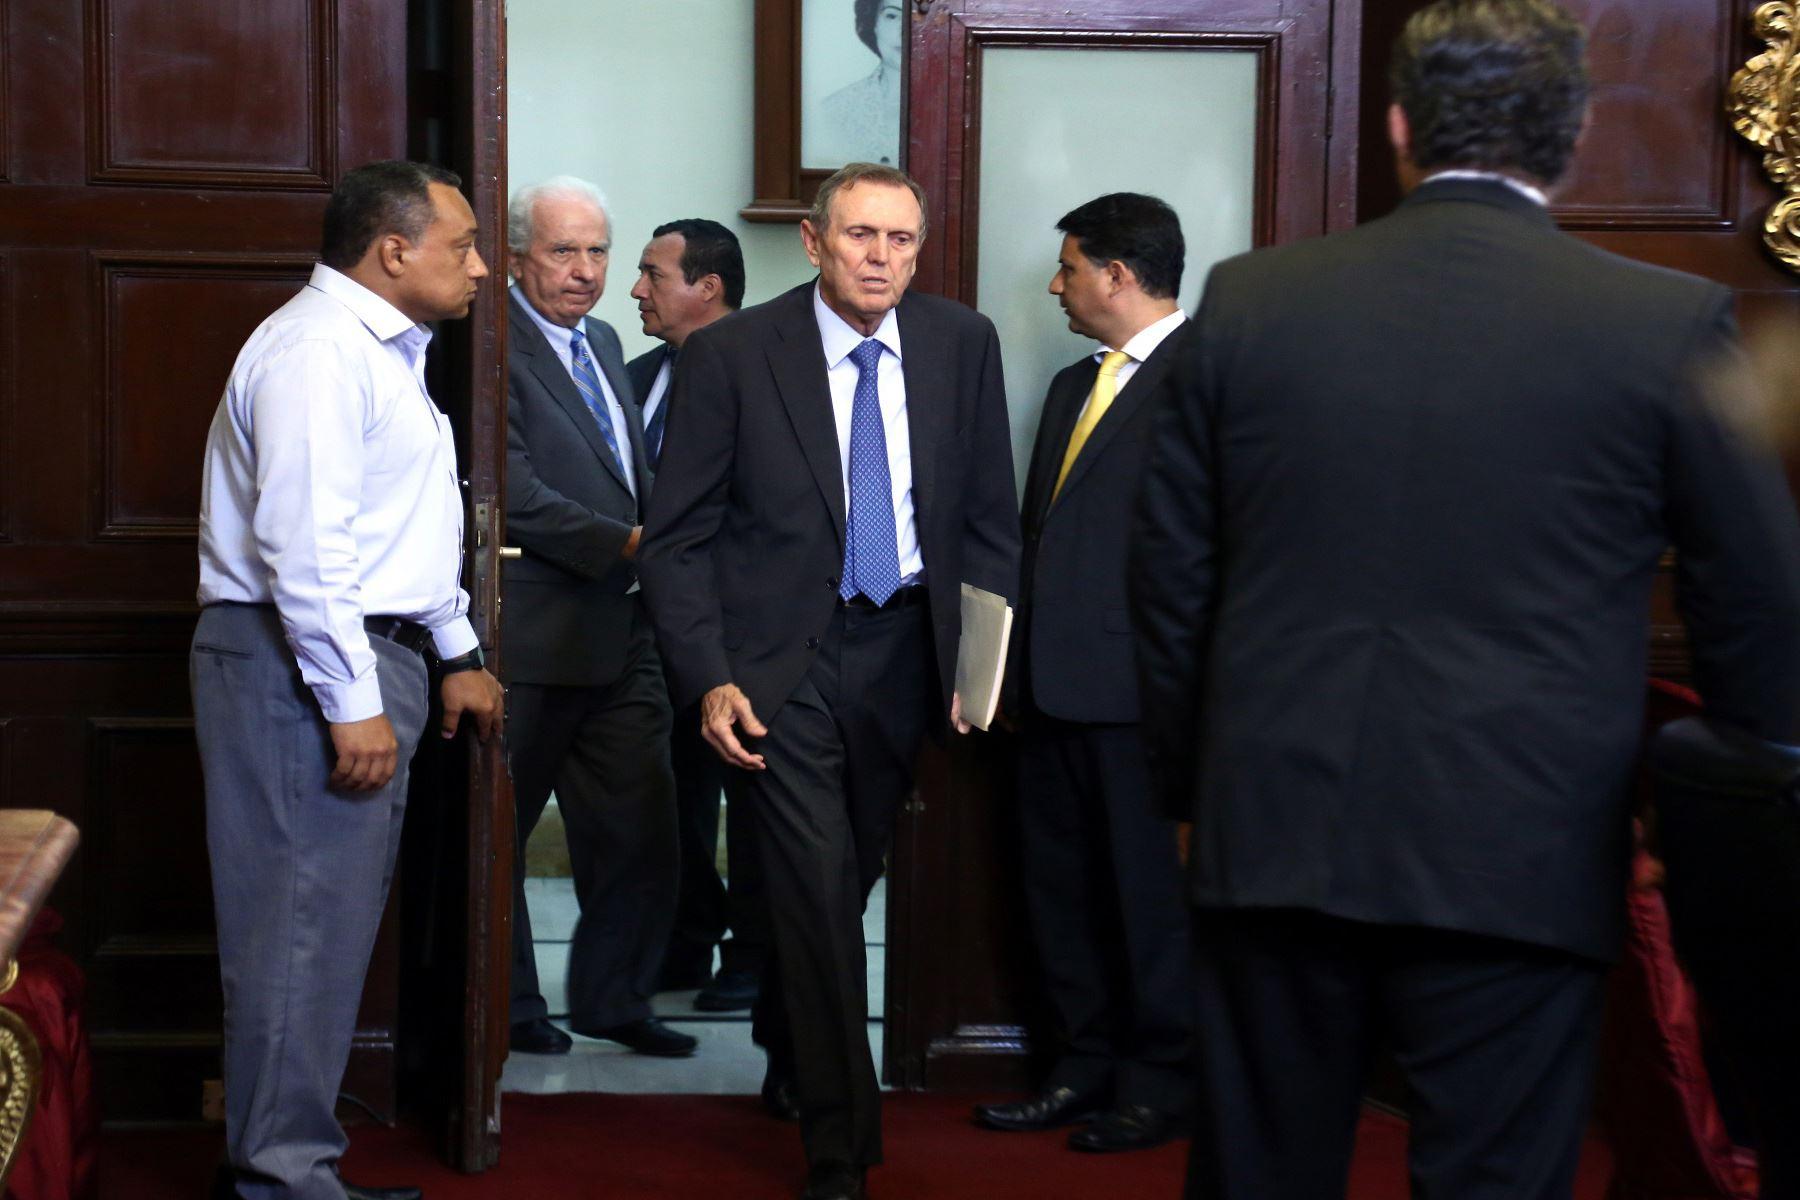 Fiscalía pide prisión preventiva para representantes de socias de Odebrecht